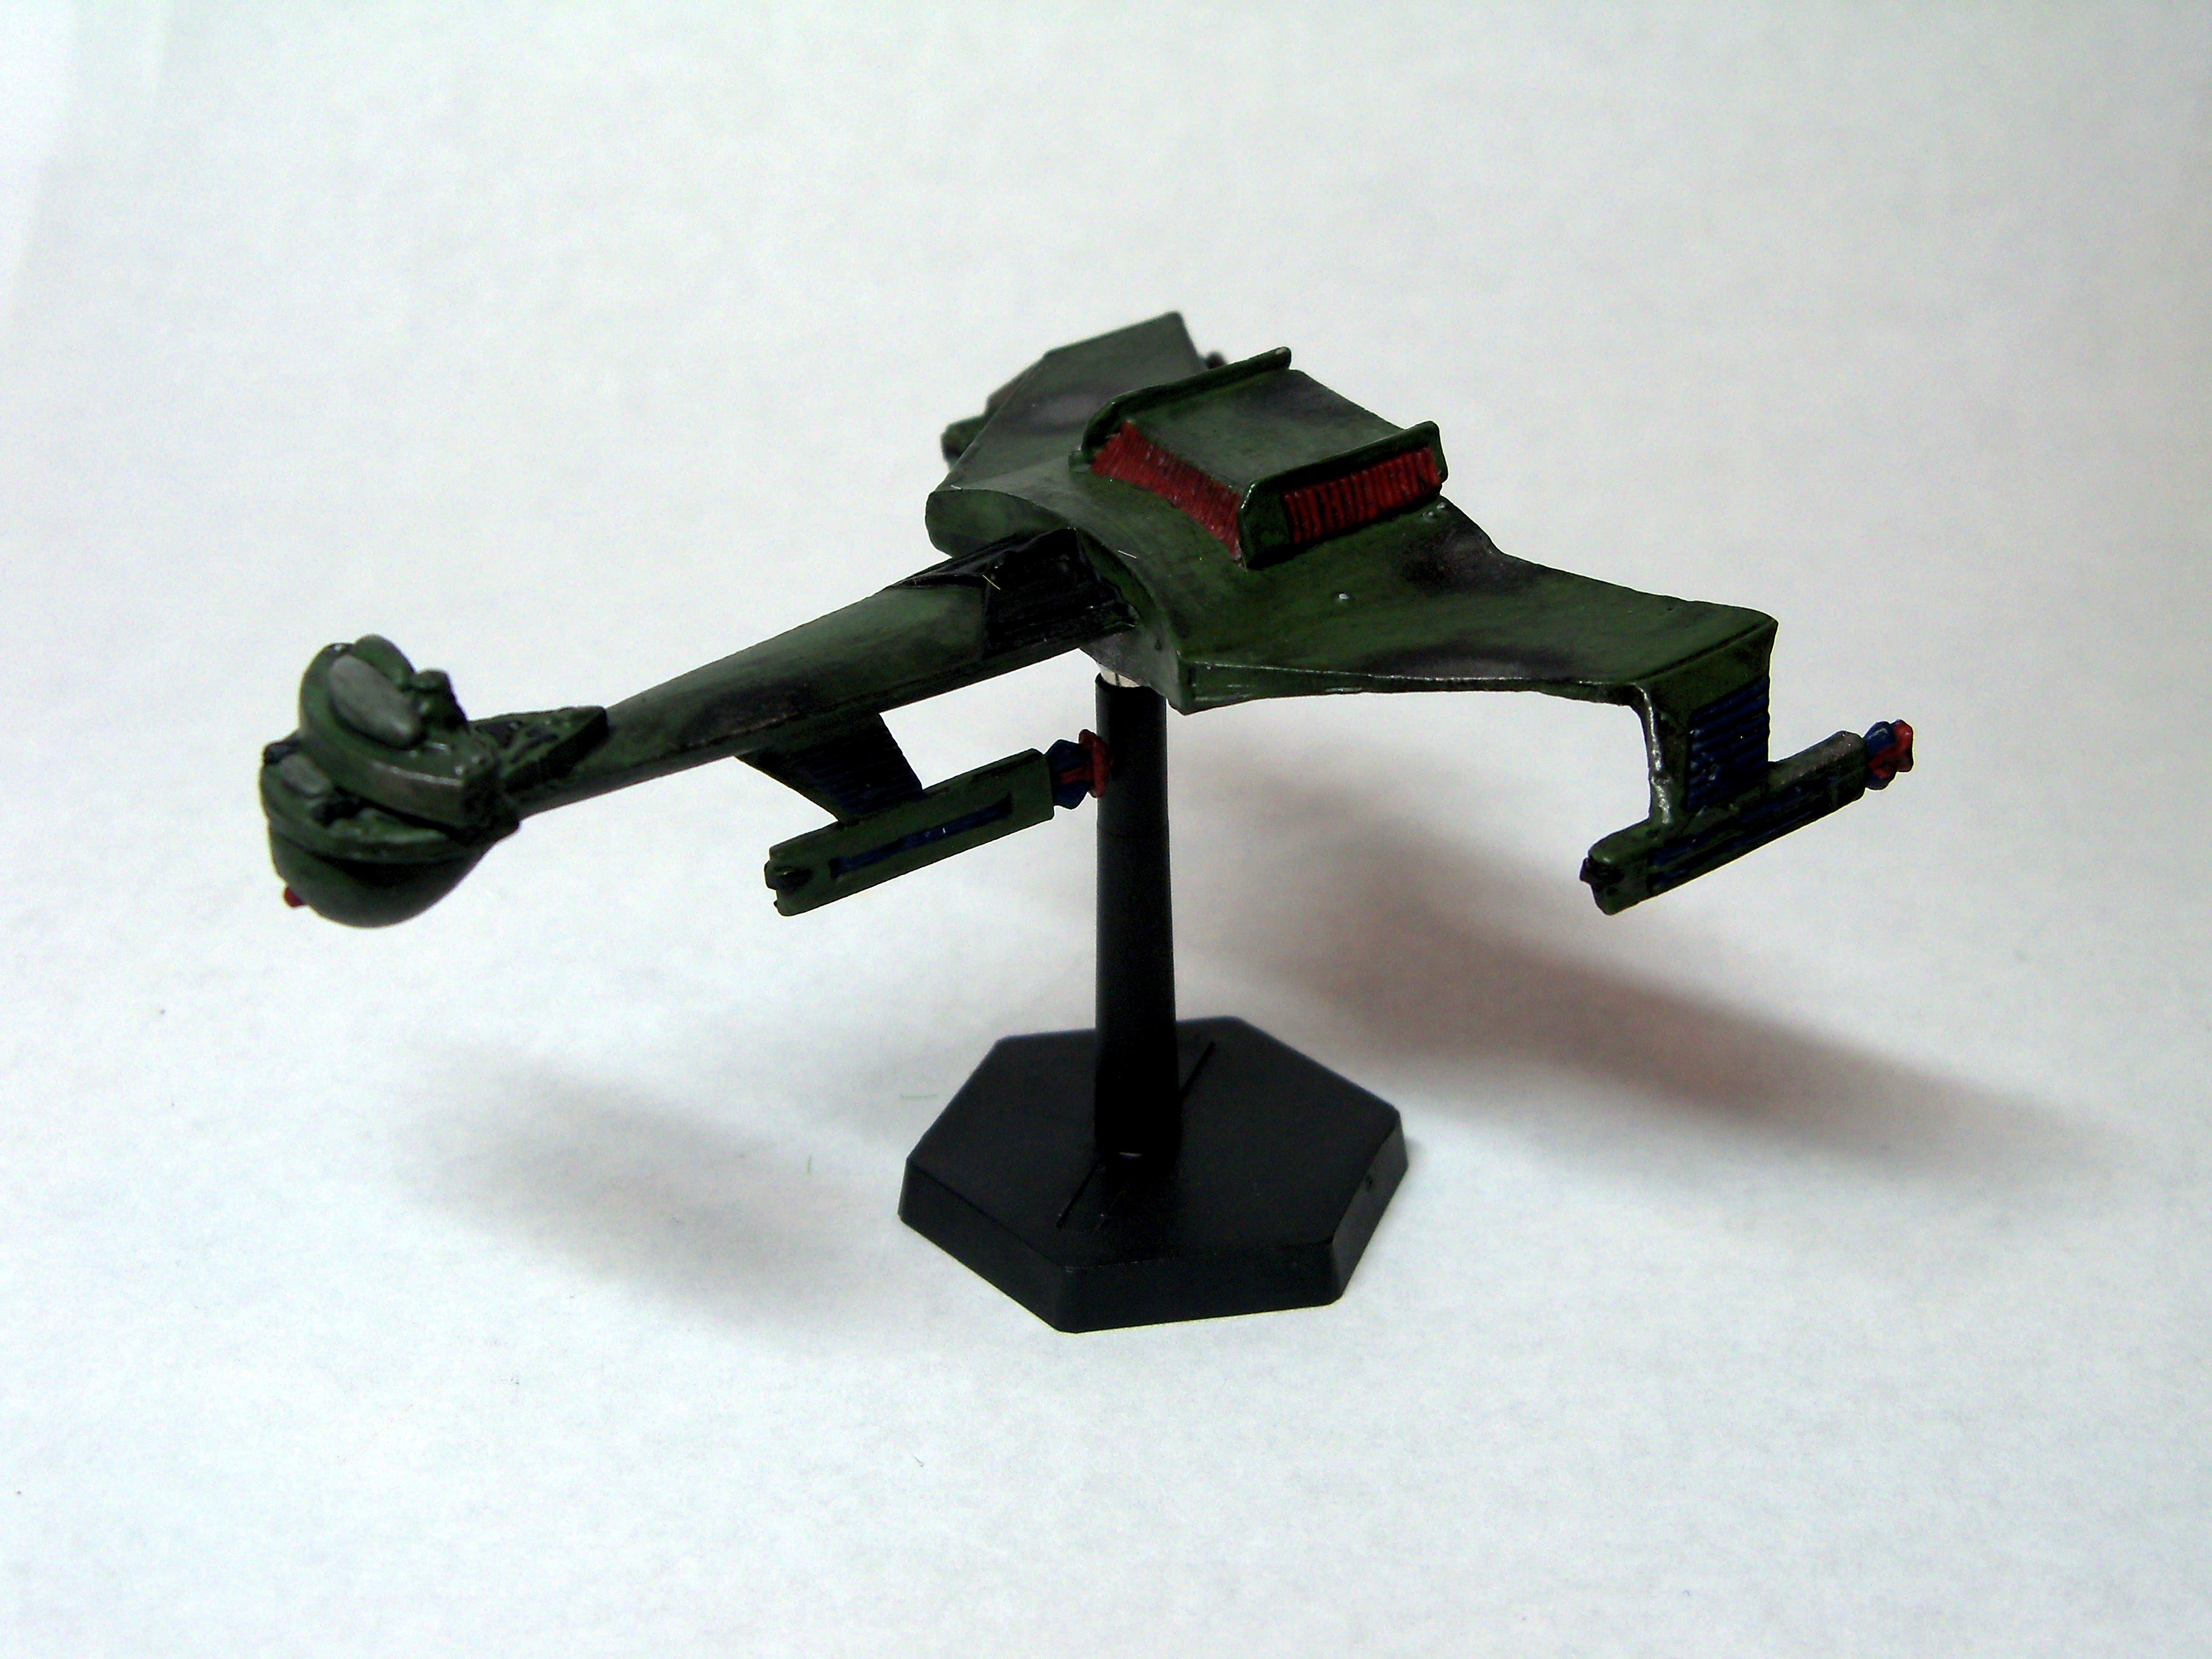 Battles, Klingon, Starfleet